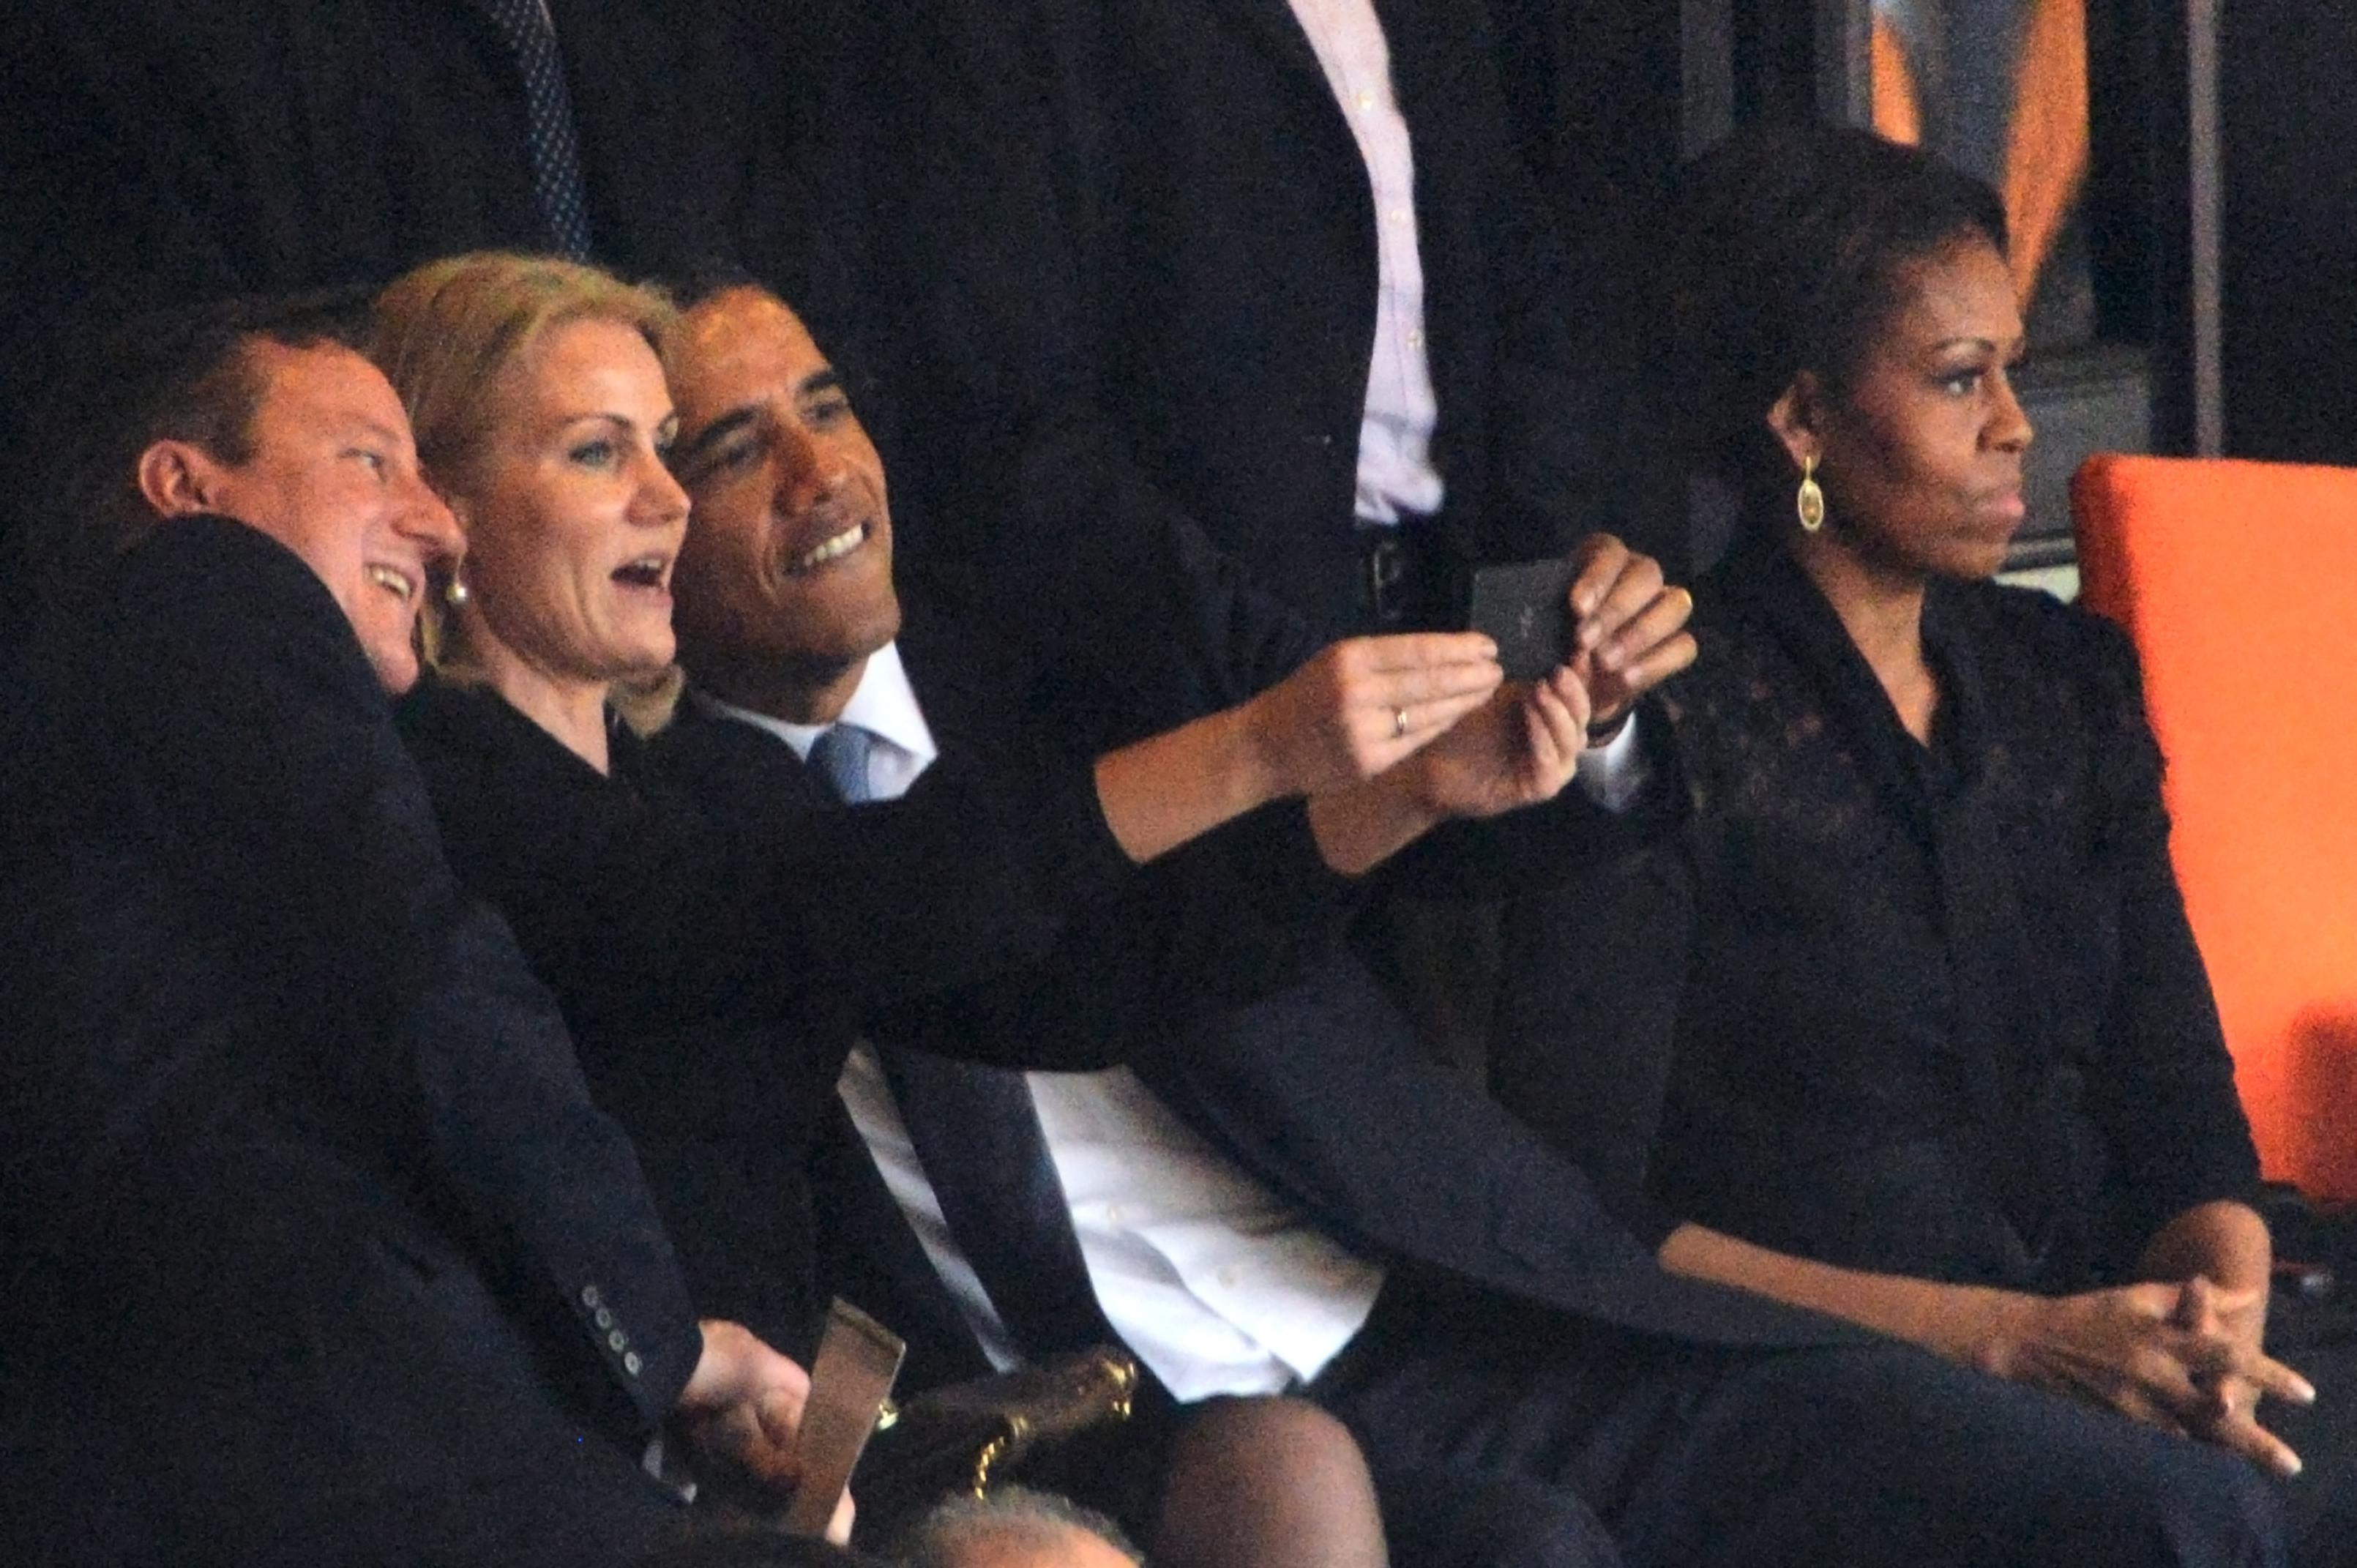 hon nhan cuu tong thong Obama va vo - elle vietnam